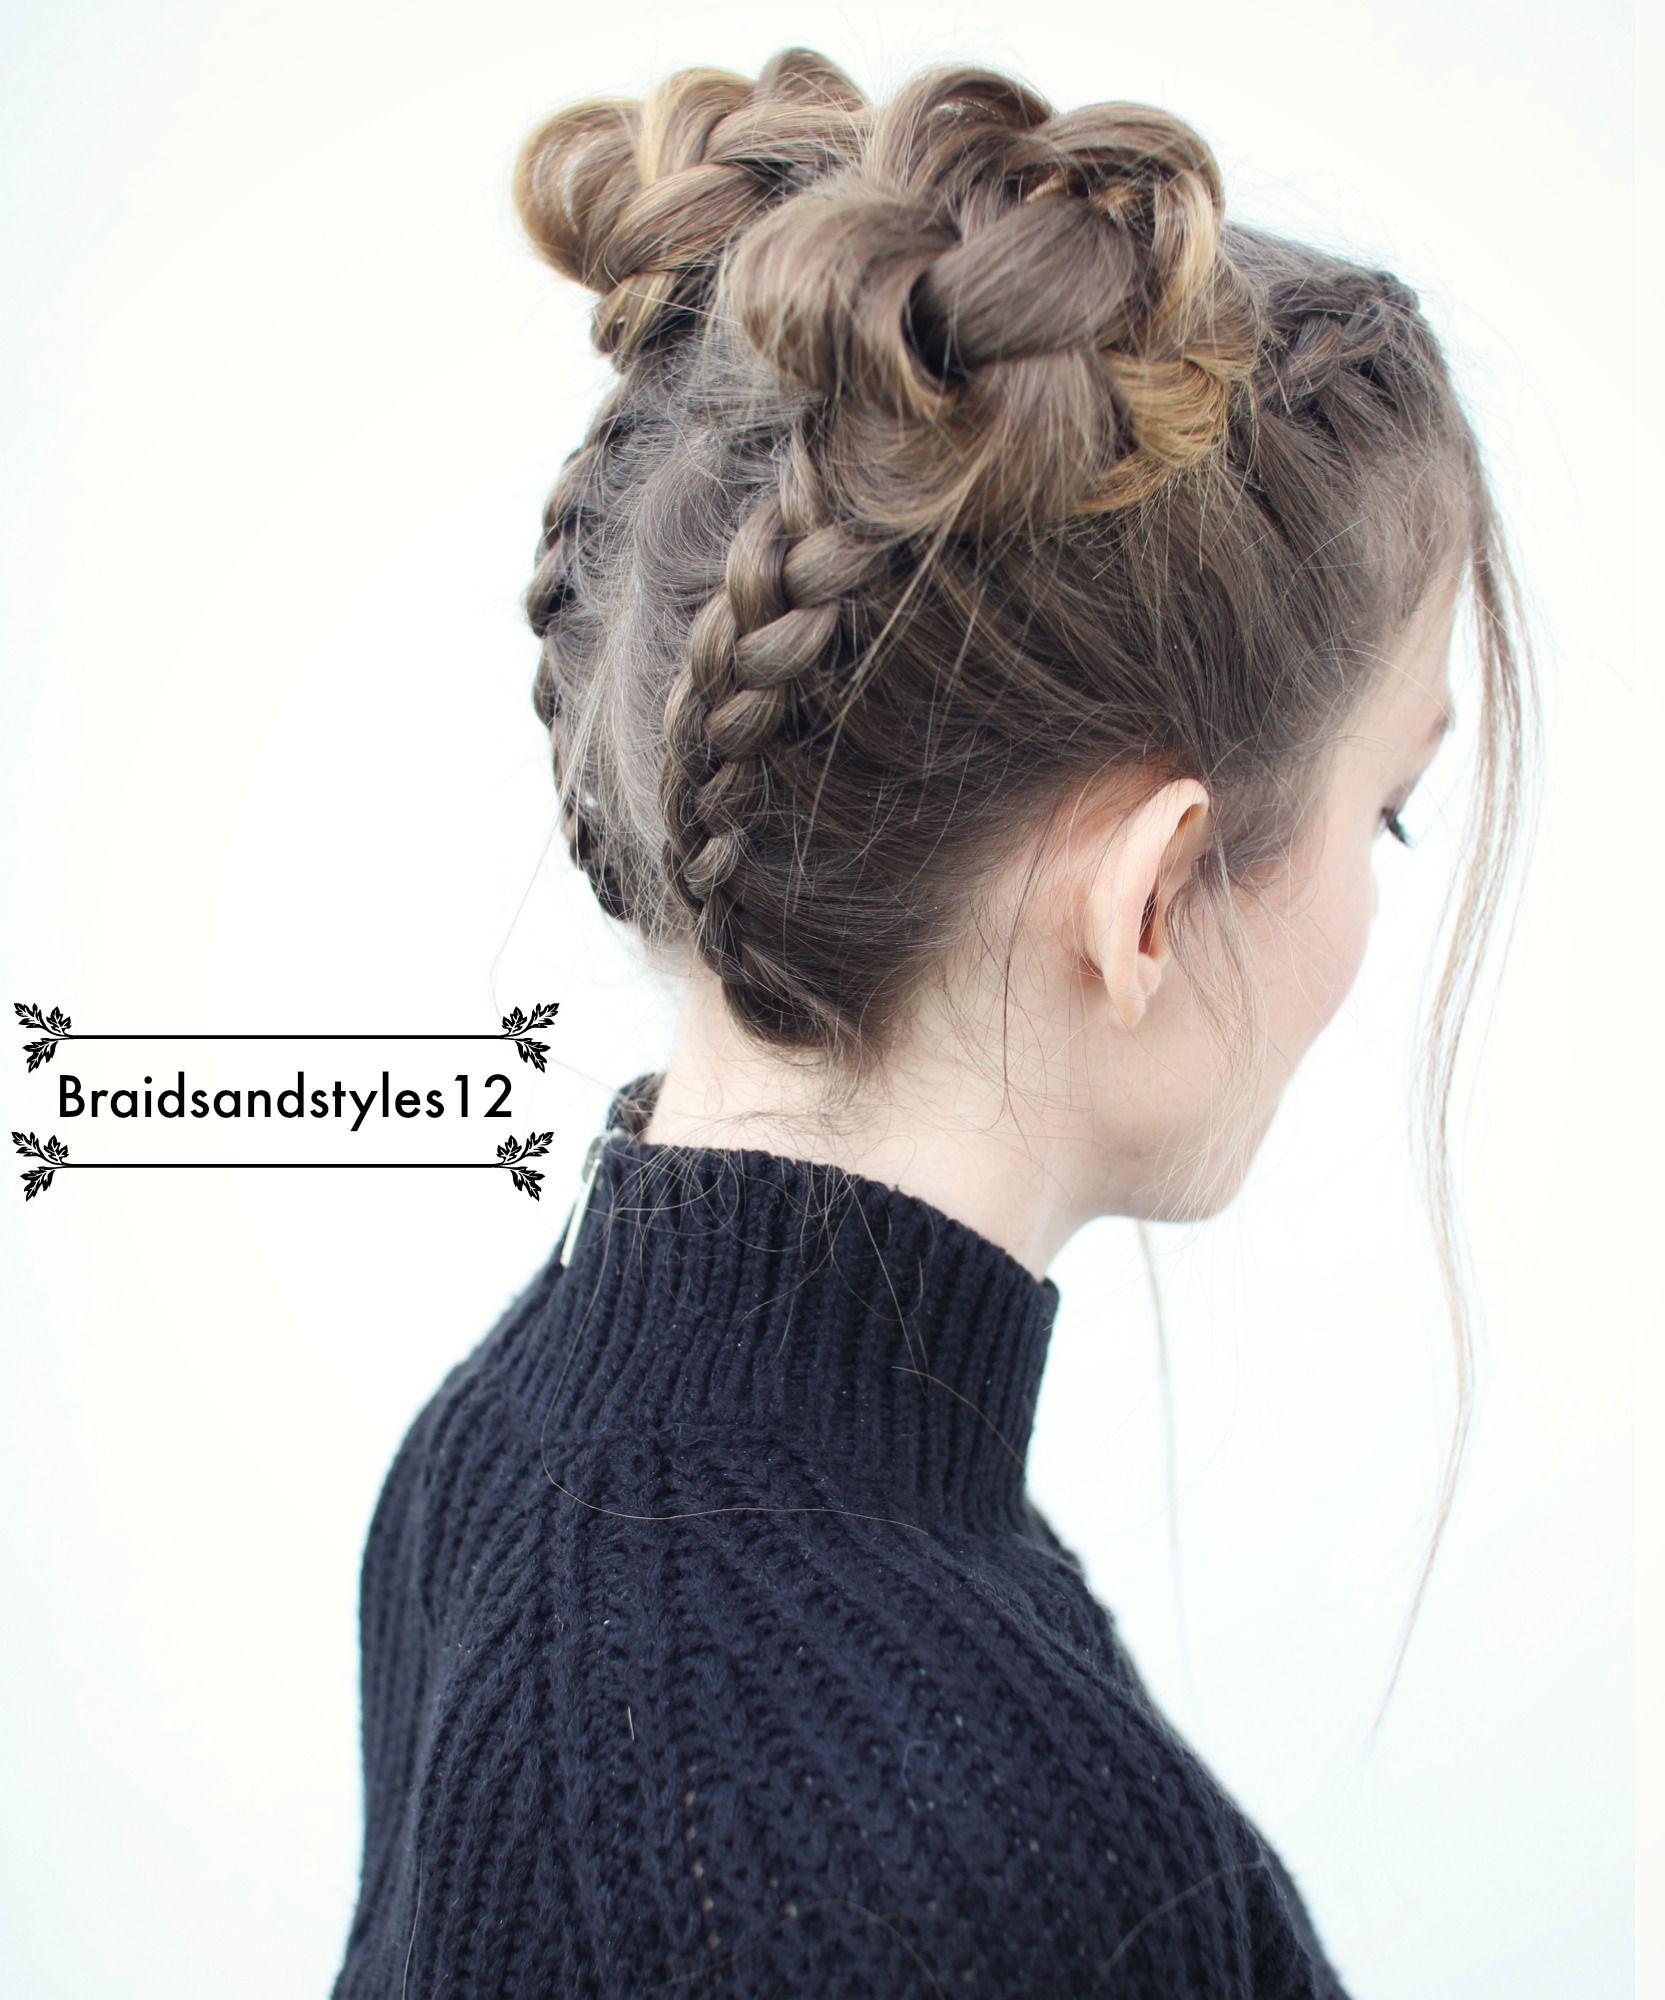 braidsandstyles12 | makeup and hair | hair, long hair styles